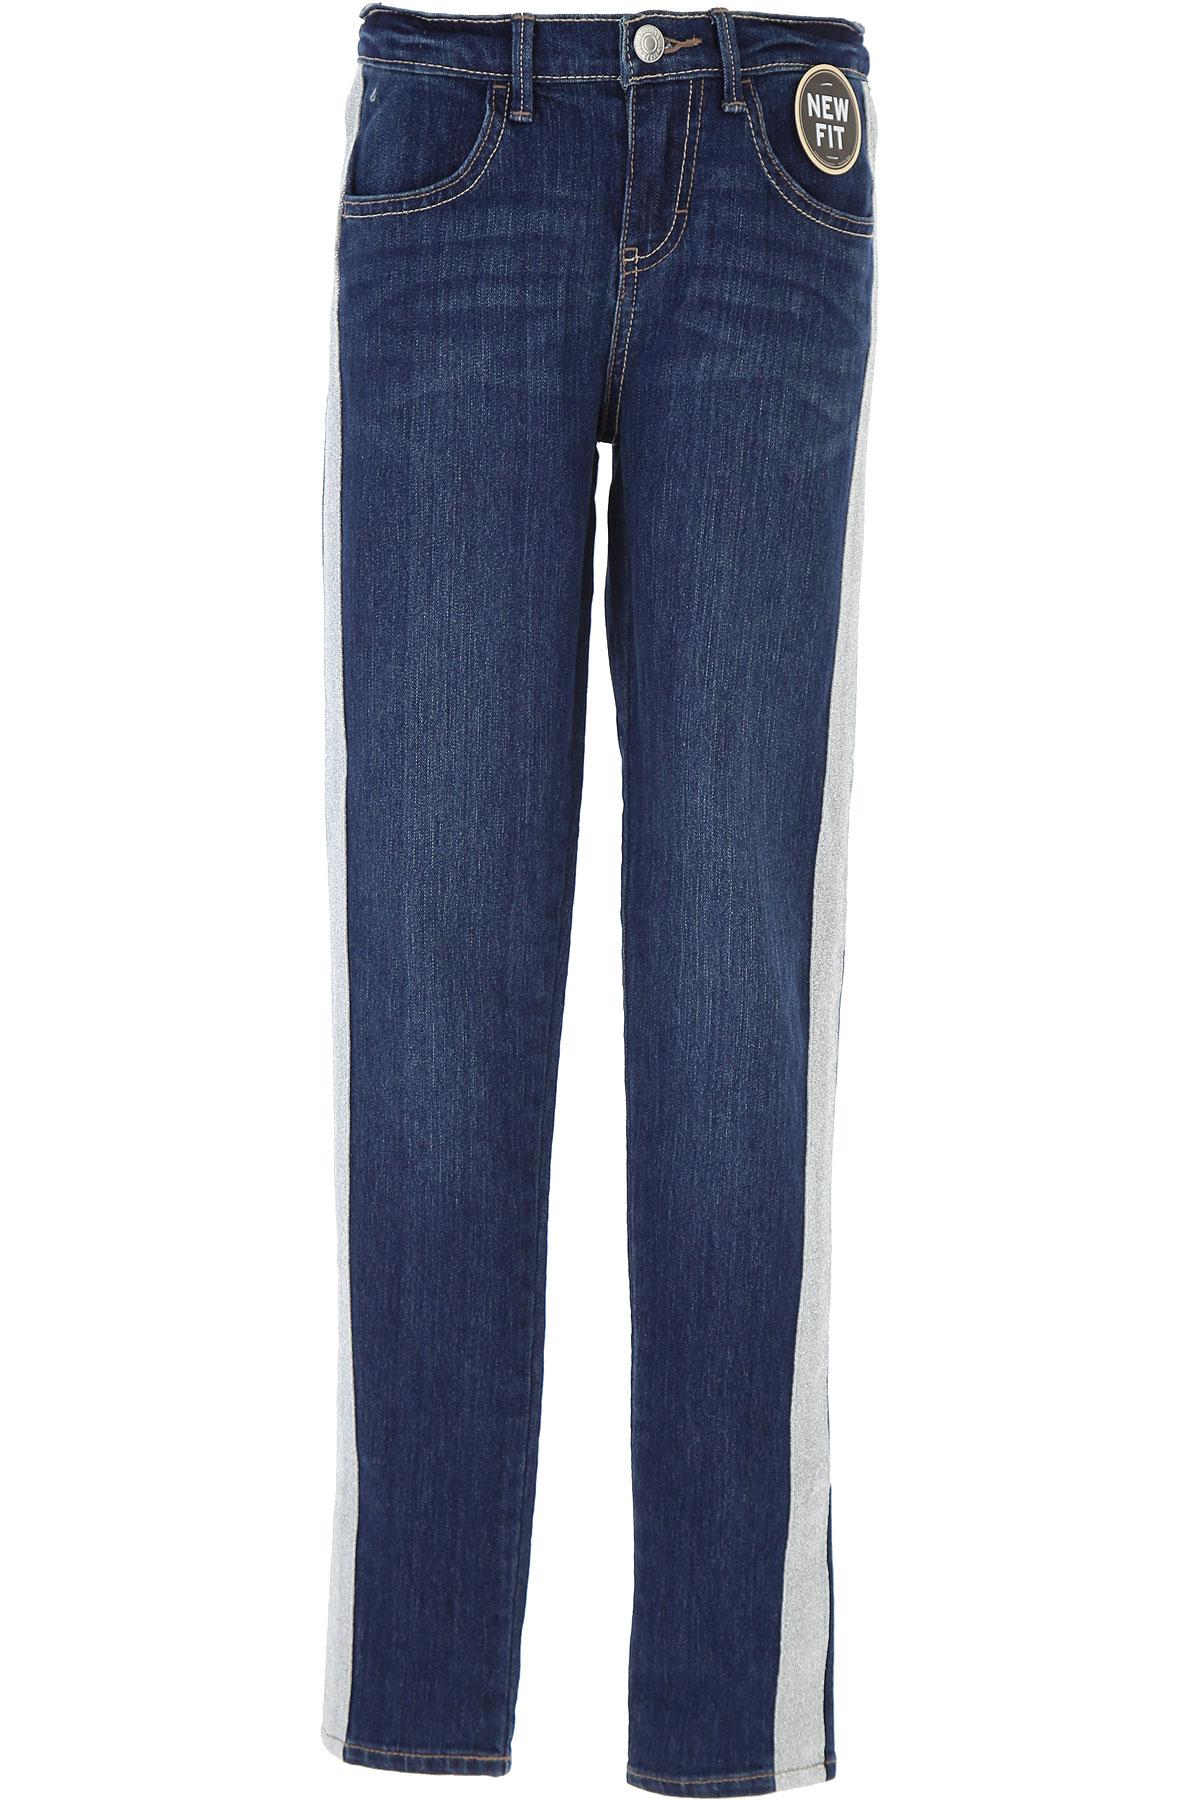 Levis Kids Jeans for Girls On Sale, Blue Denim, Cotton, 2019, 10Y 12Y 14Y 16Y